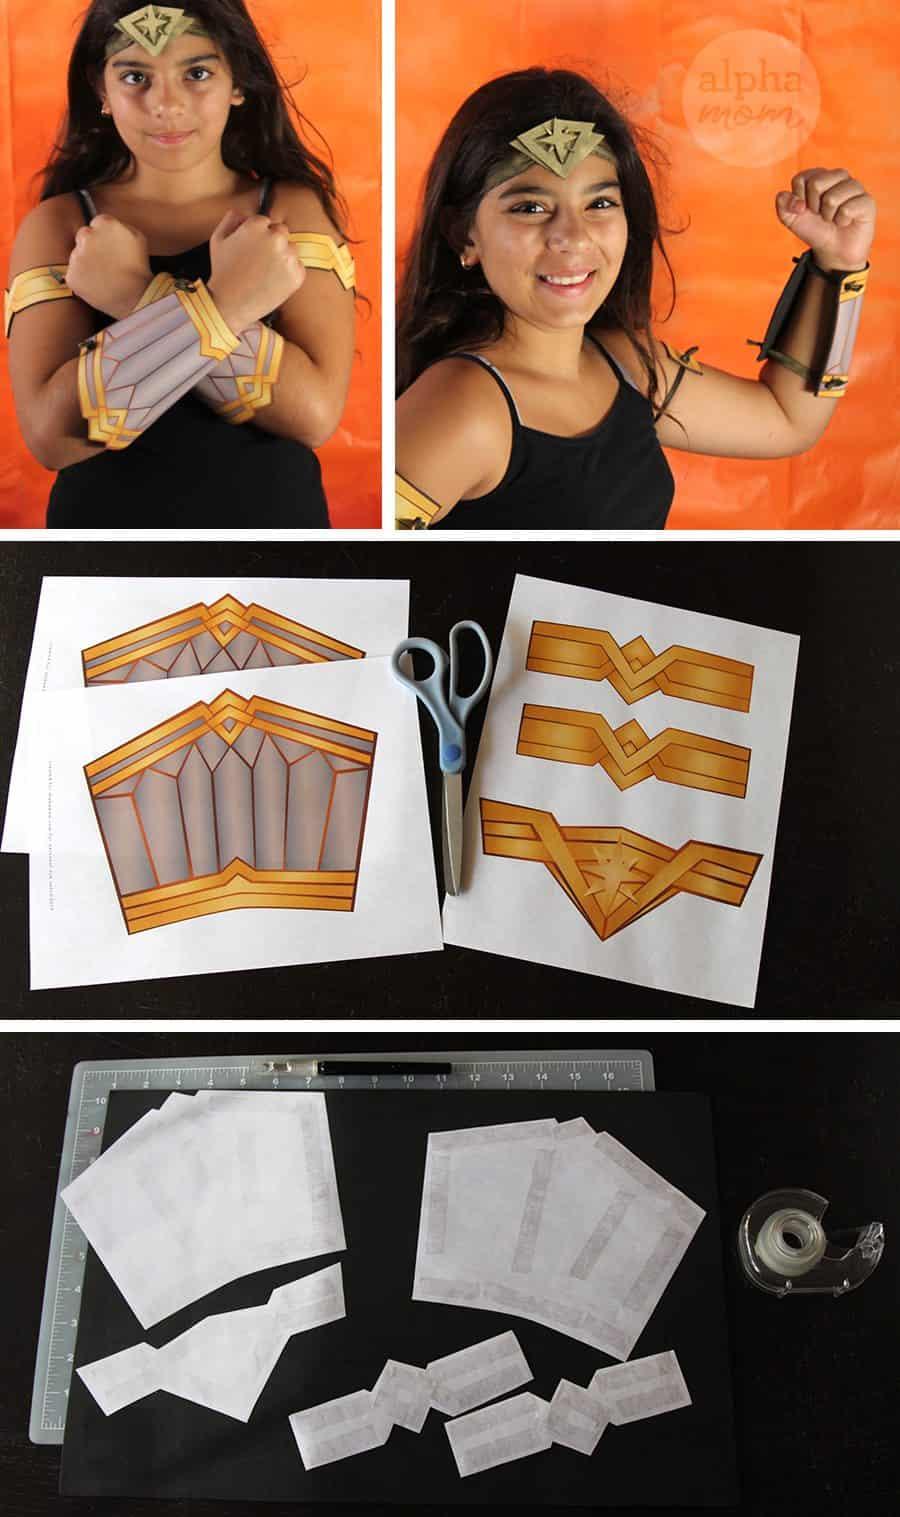 Kids' Wonder Woman Costume with Homemade Headband, Cuffs and Armbands! (DIY) by Brenda Ponnay for Alphamom.com